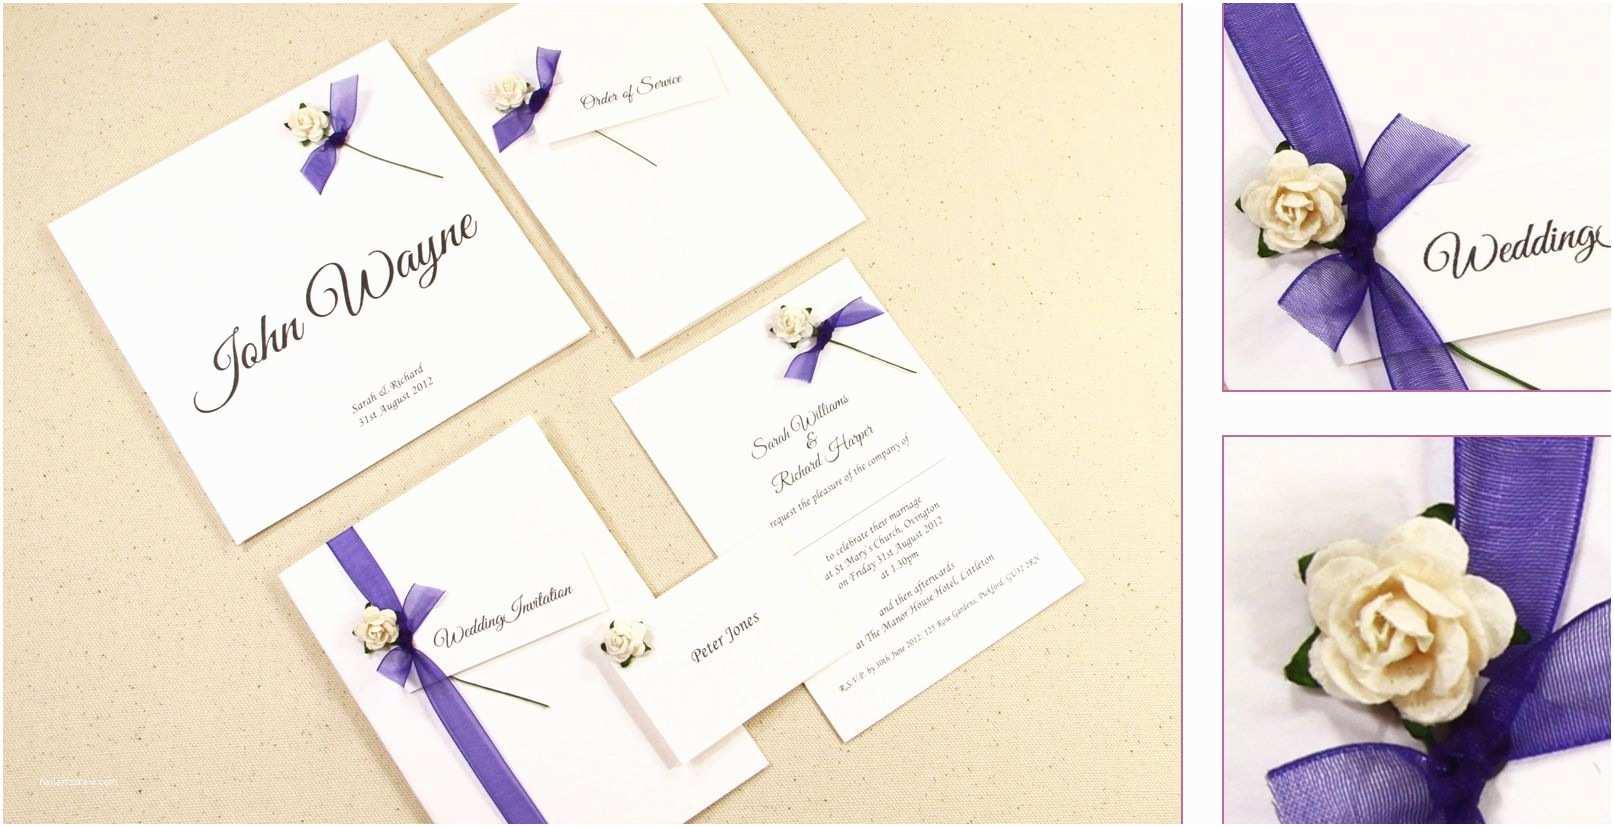 Custom Made Wedding Invitations Divine Handmade Invitations & Wedding Stationery